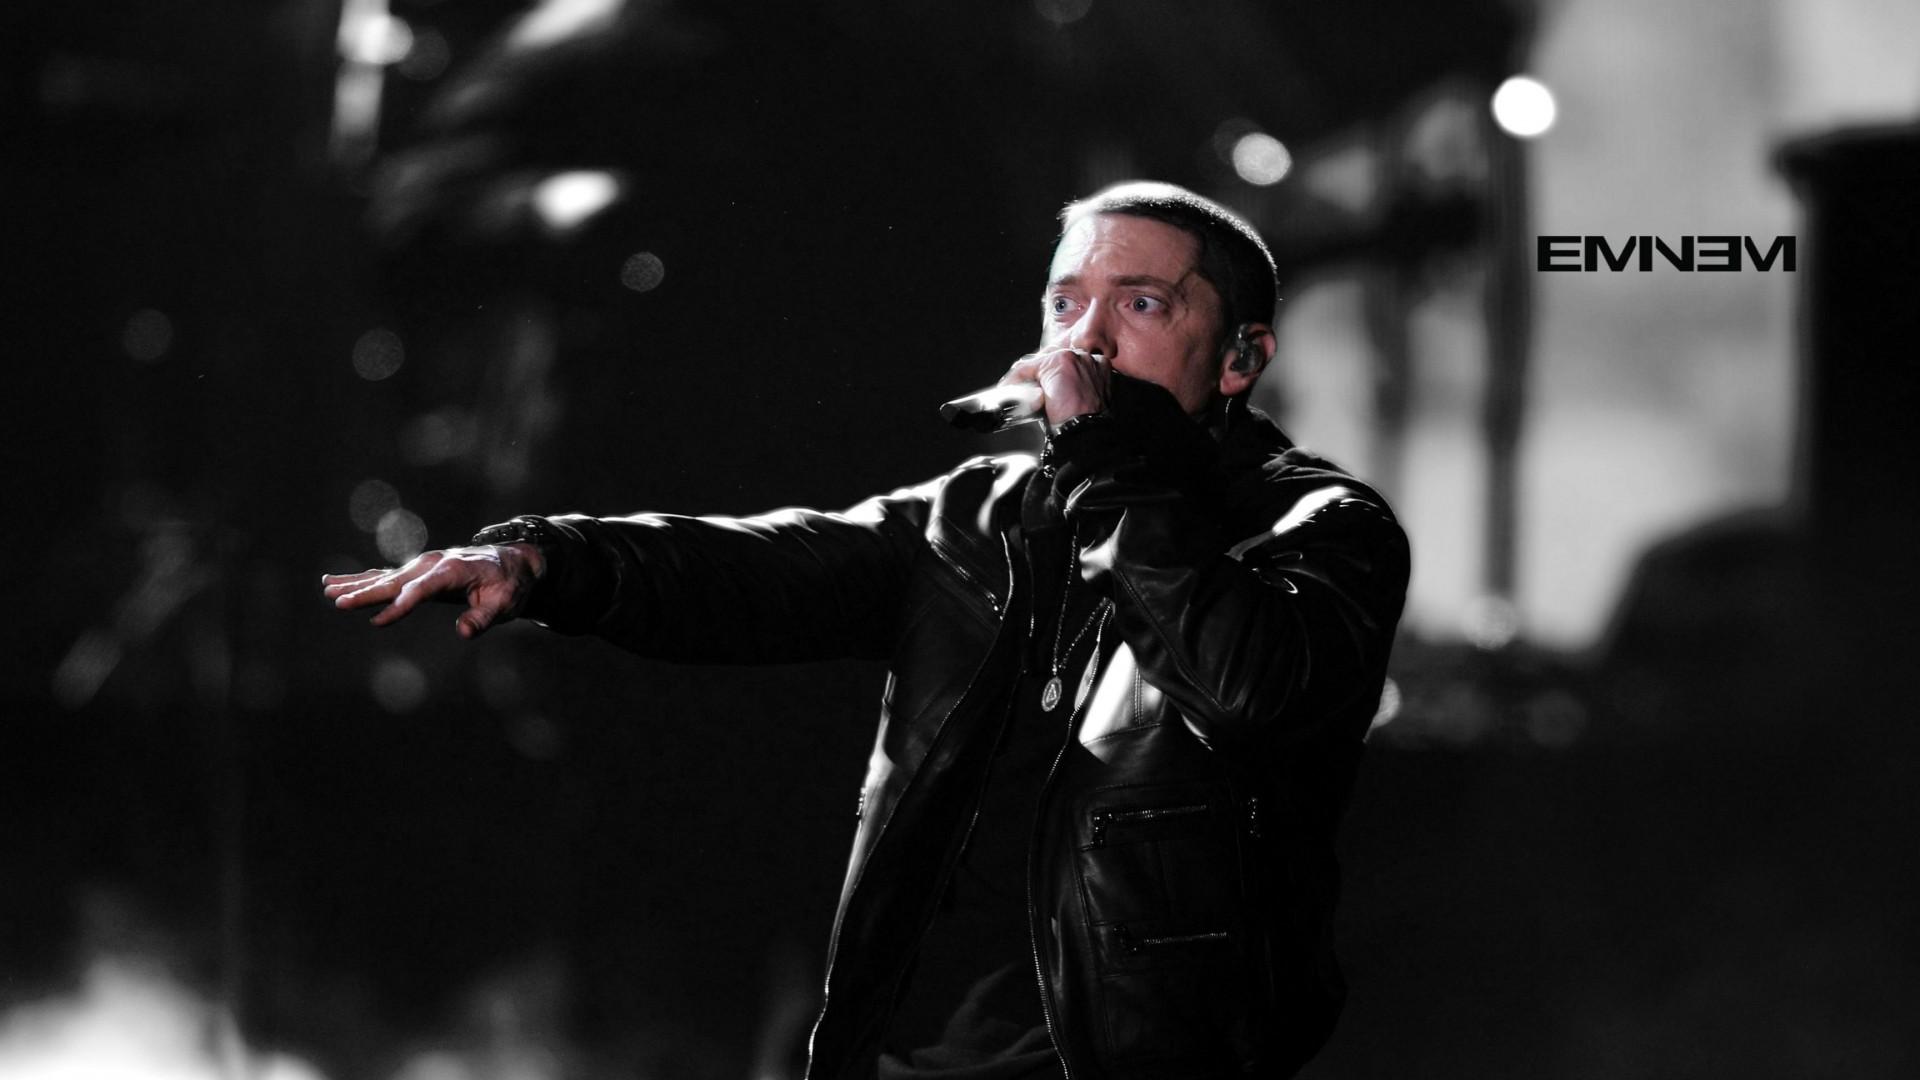 Wallpaper Eminem Singer Rapper Actor 4k Celebrities